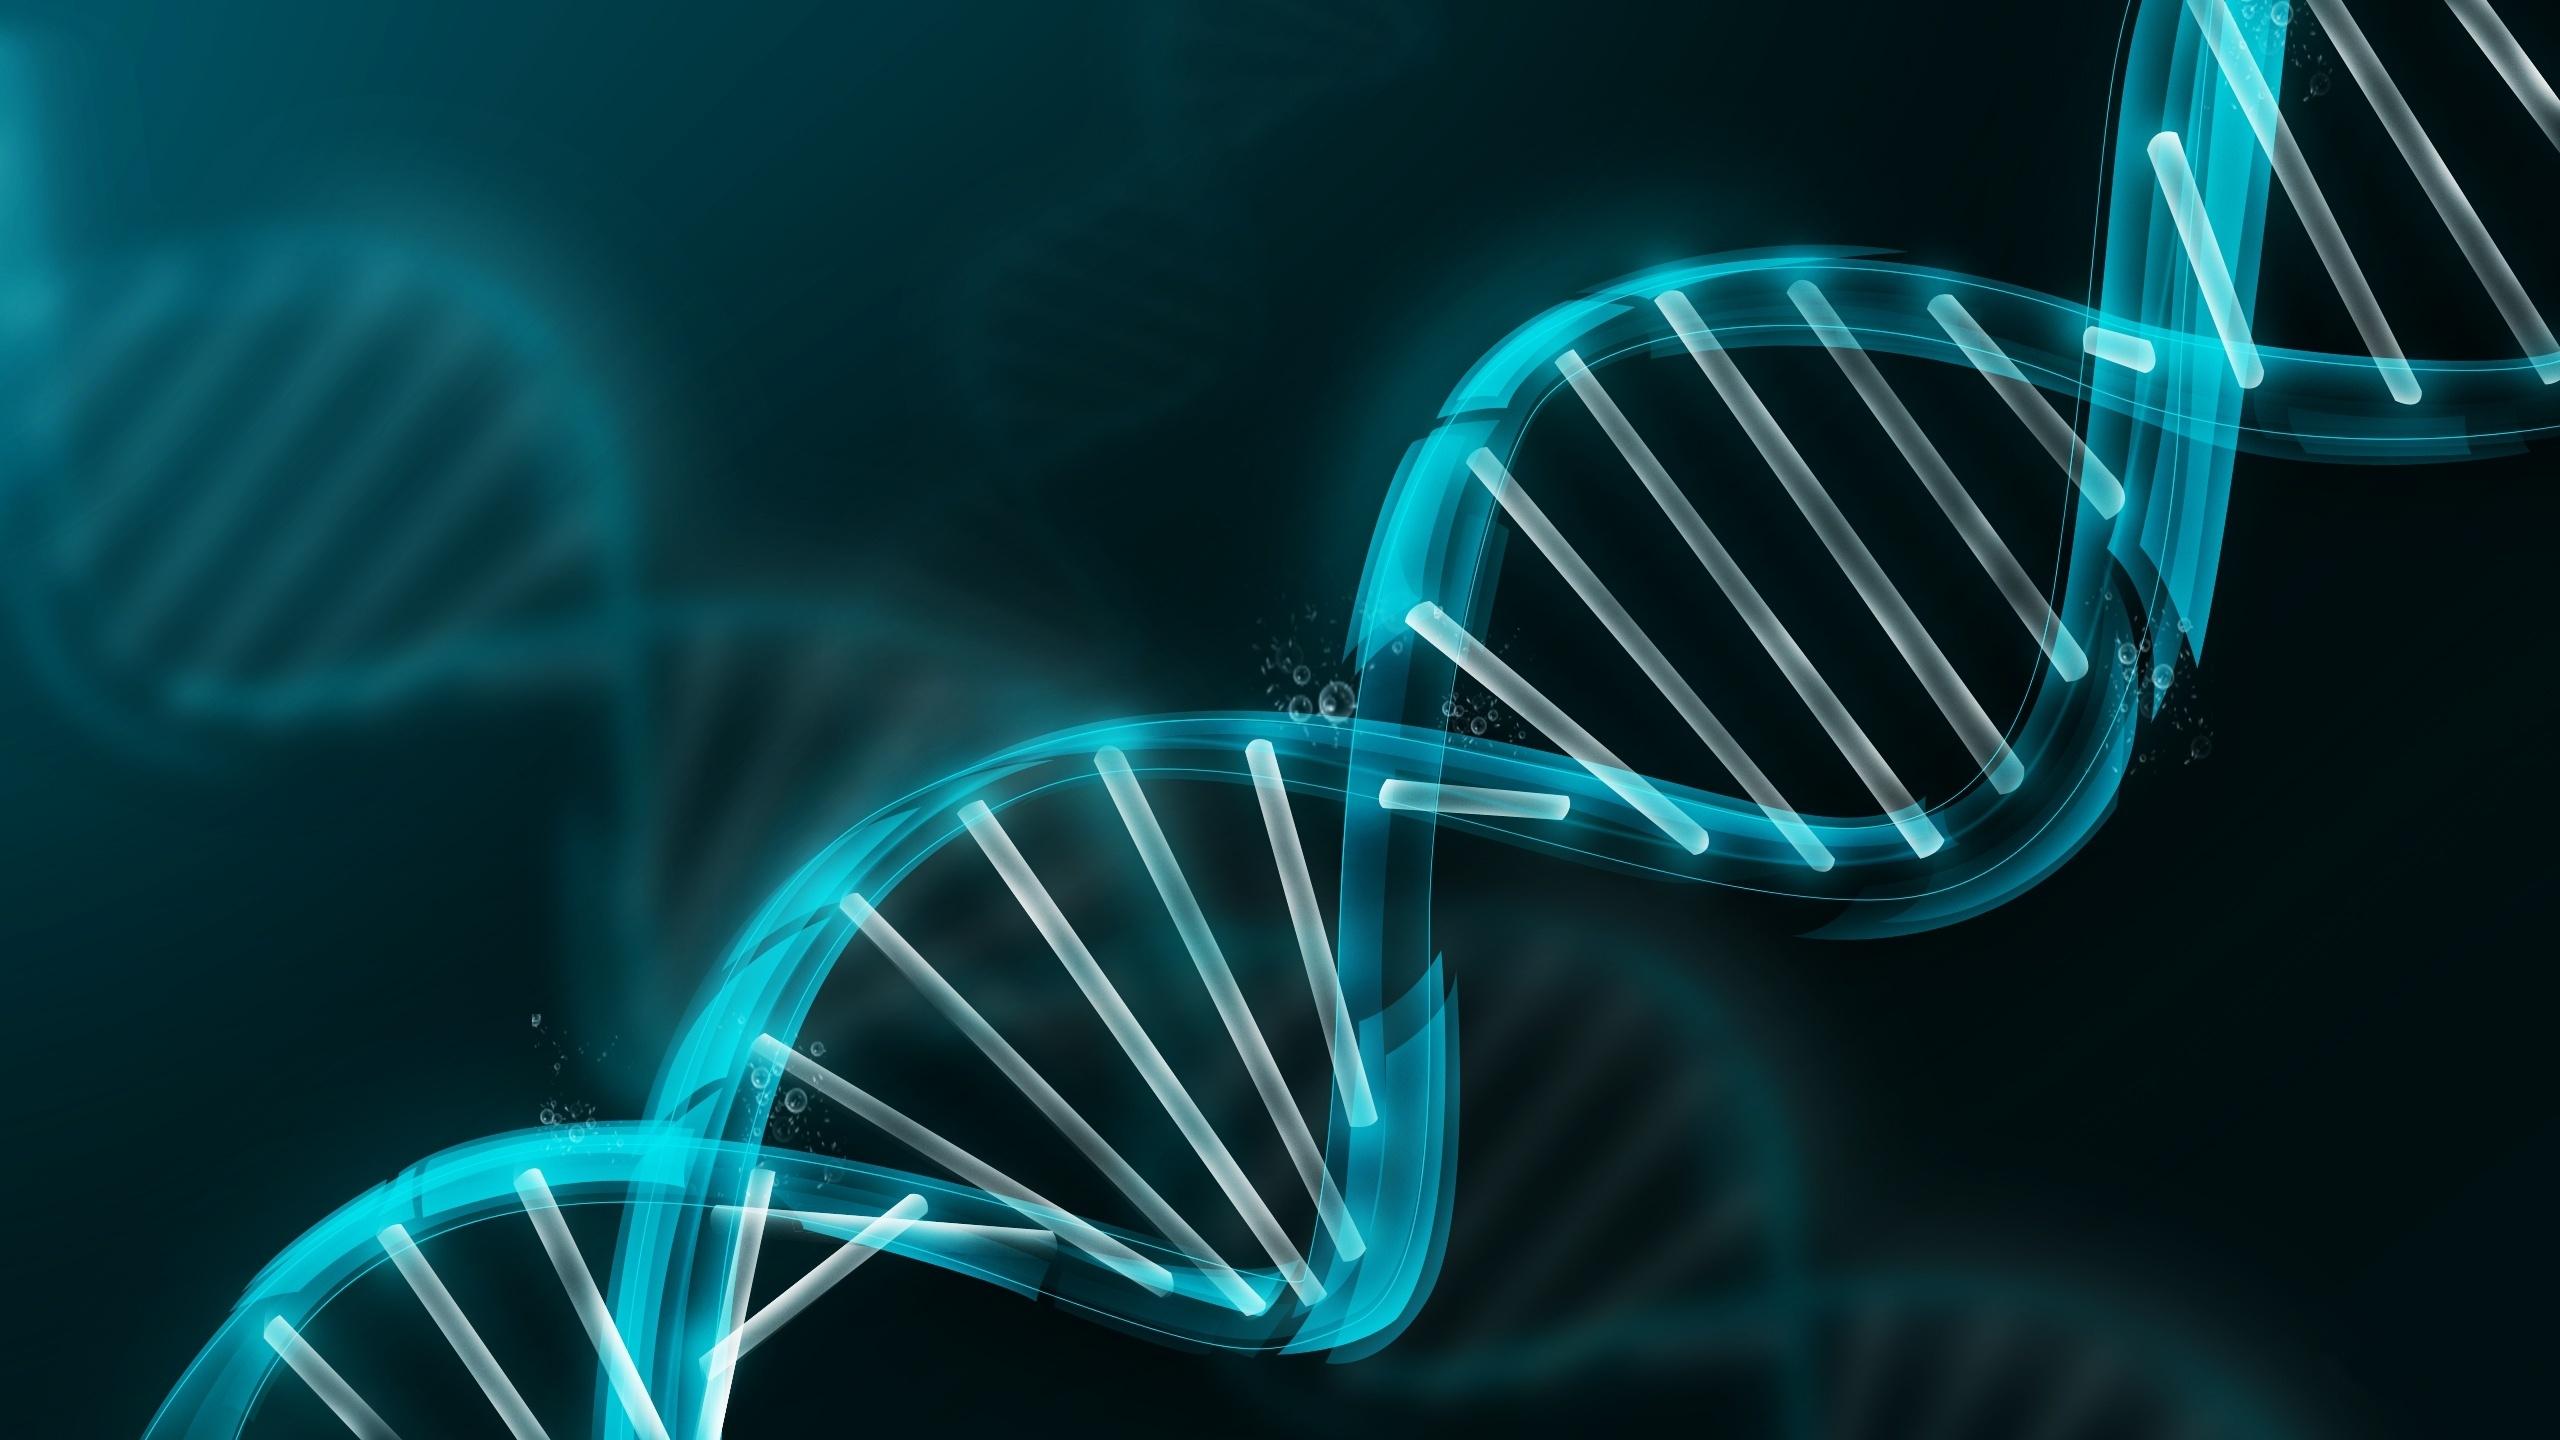 Genetic DNA Widescreen Wallpaper 50091 2560x1440px 2560x1440